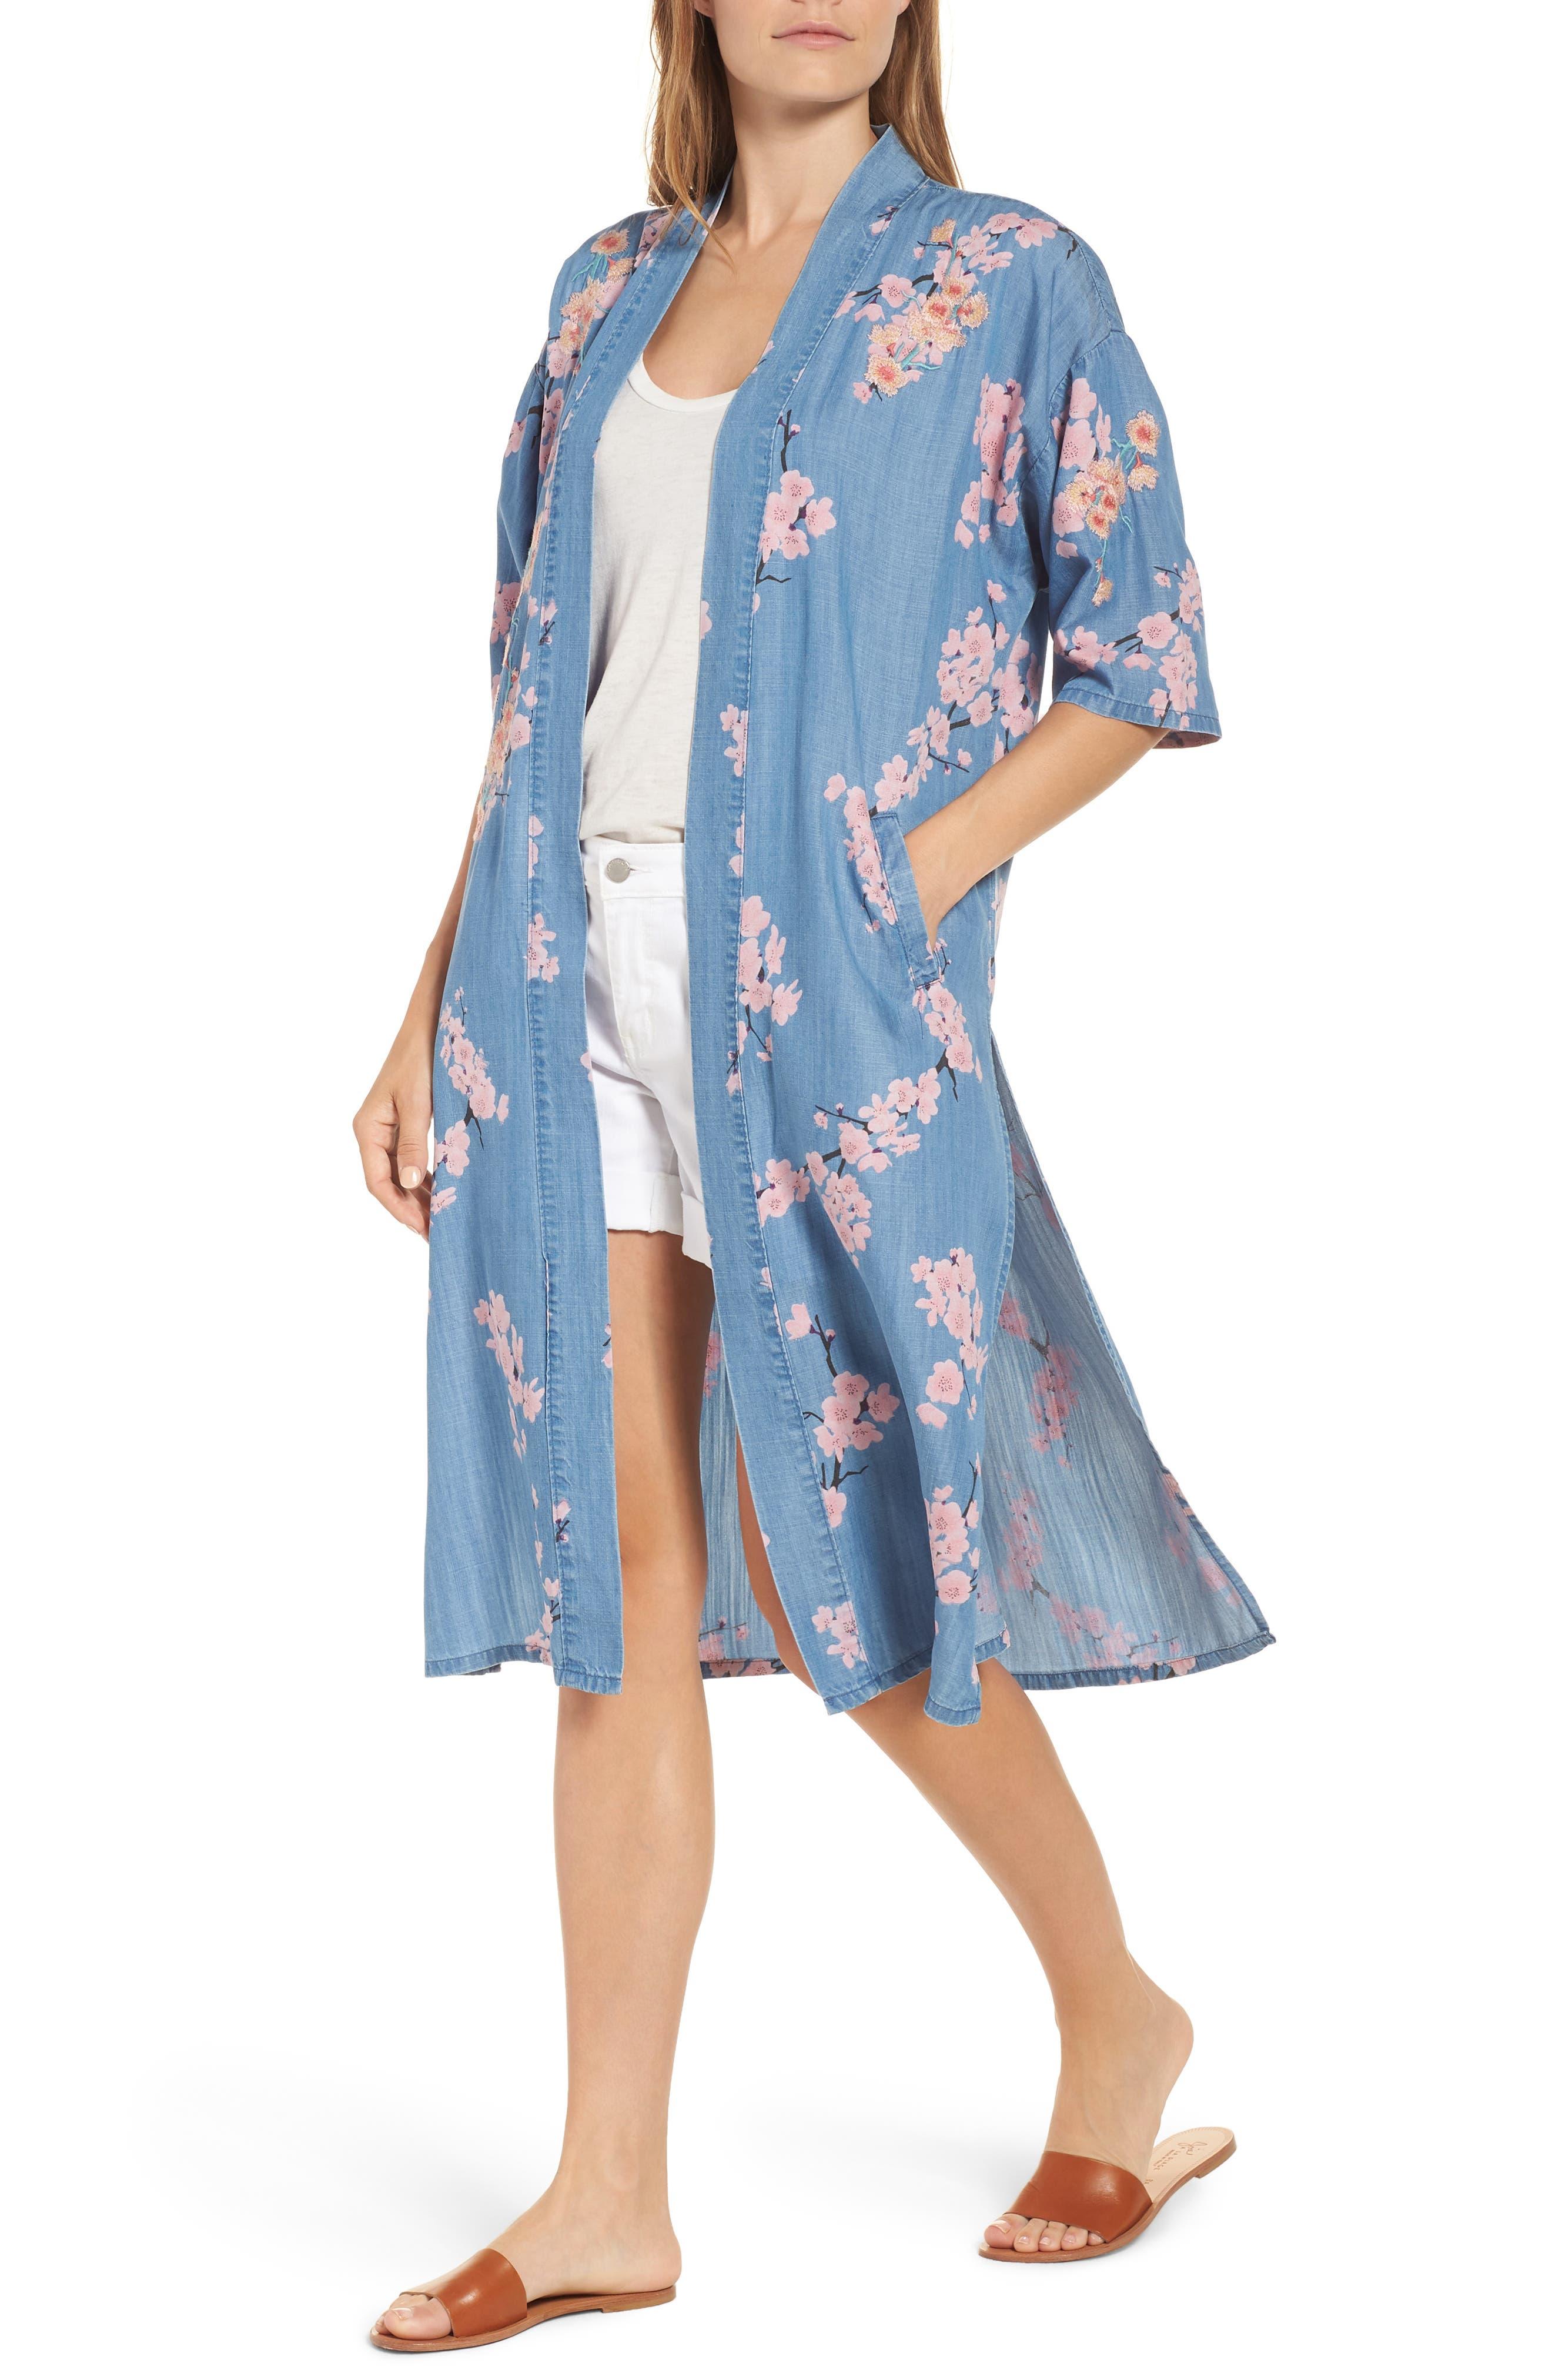 Cherry Blossom Kimono,                             Alternate thumbnail 6, color,                             Blue Cherry Blossom